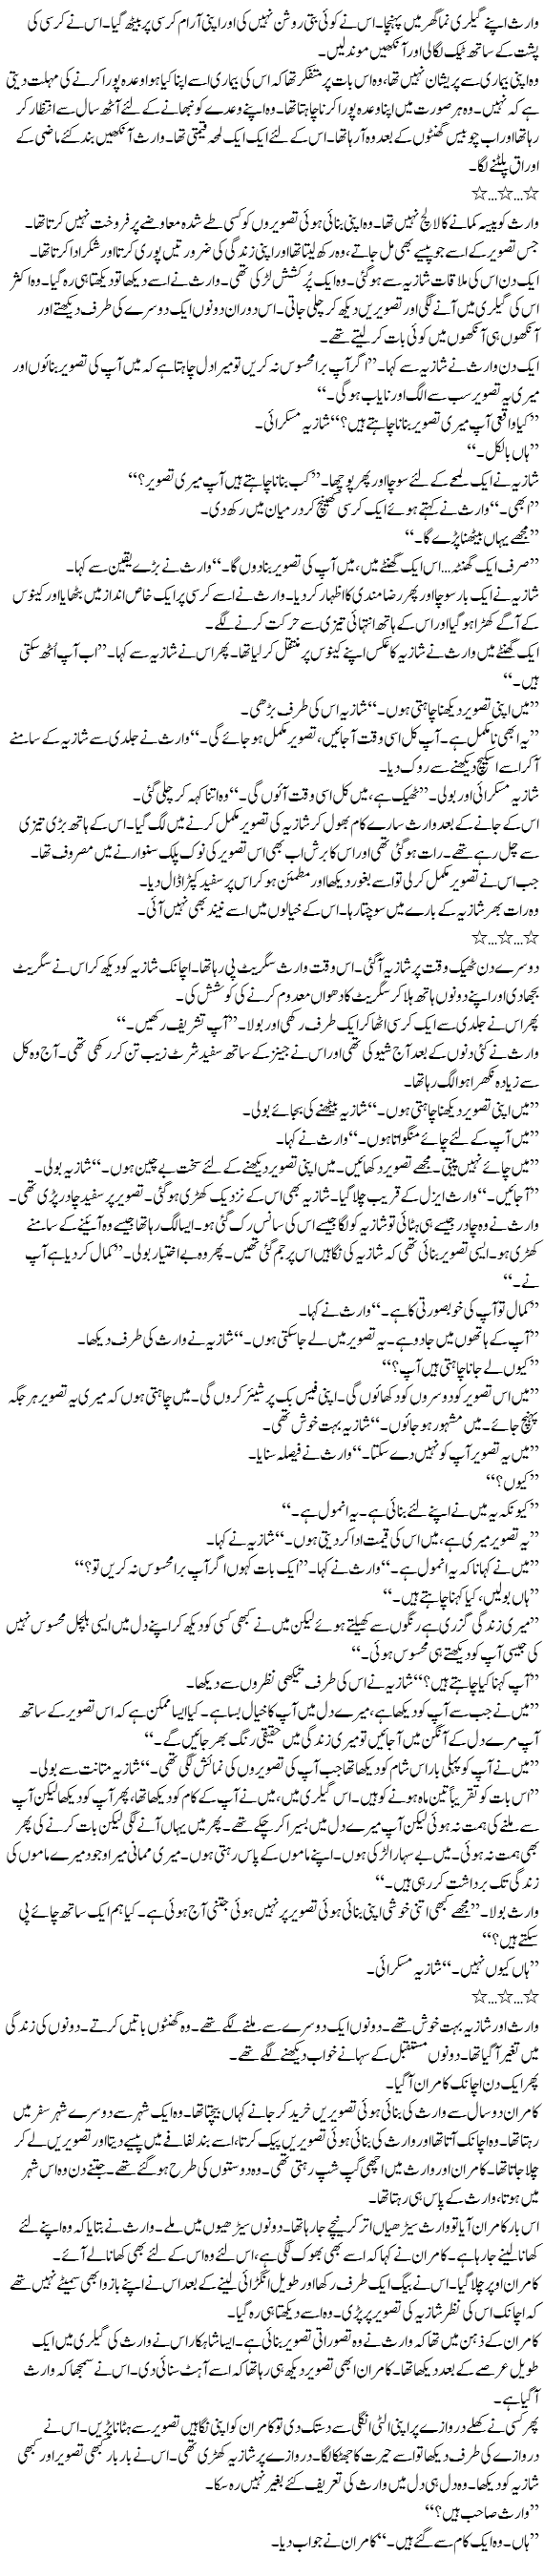 bebasi-part-2